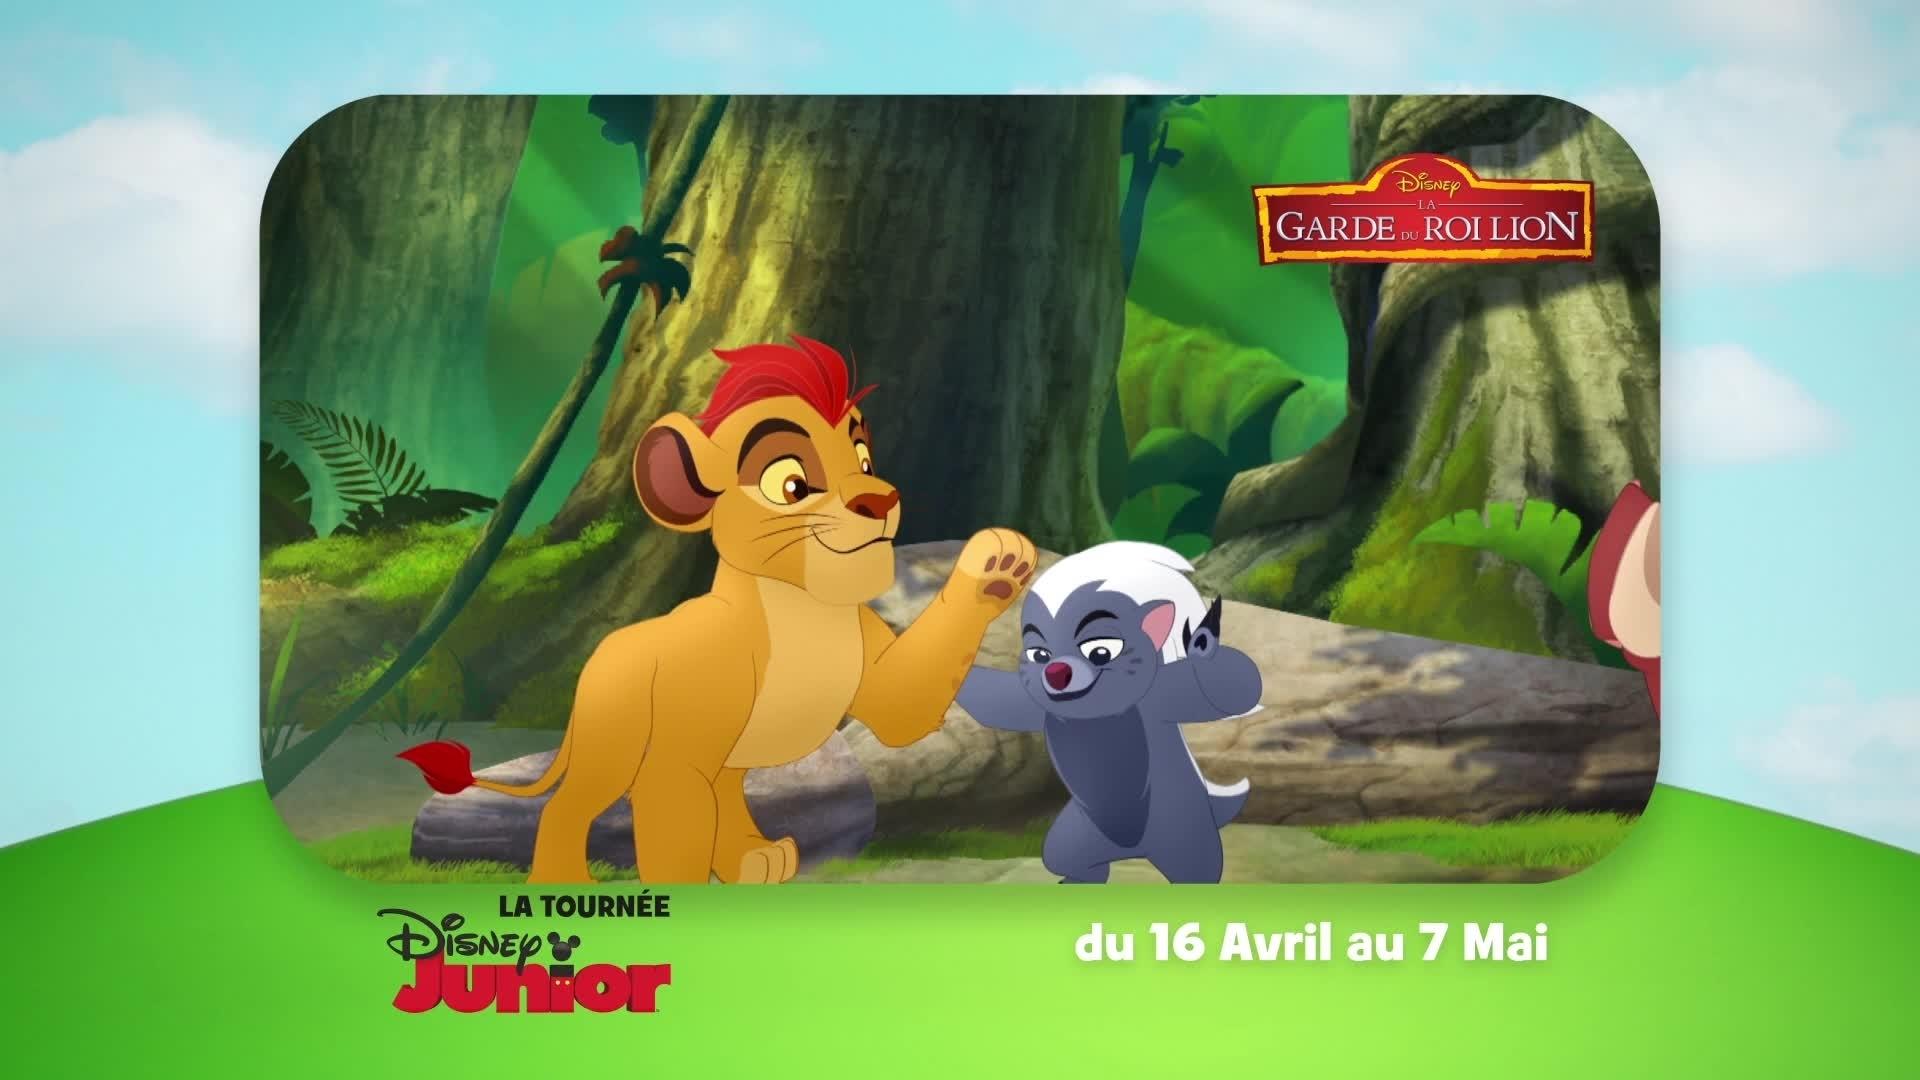 La Tournée Disney Junior